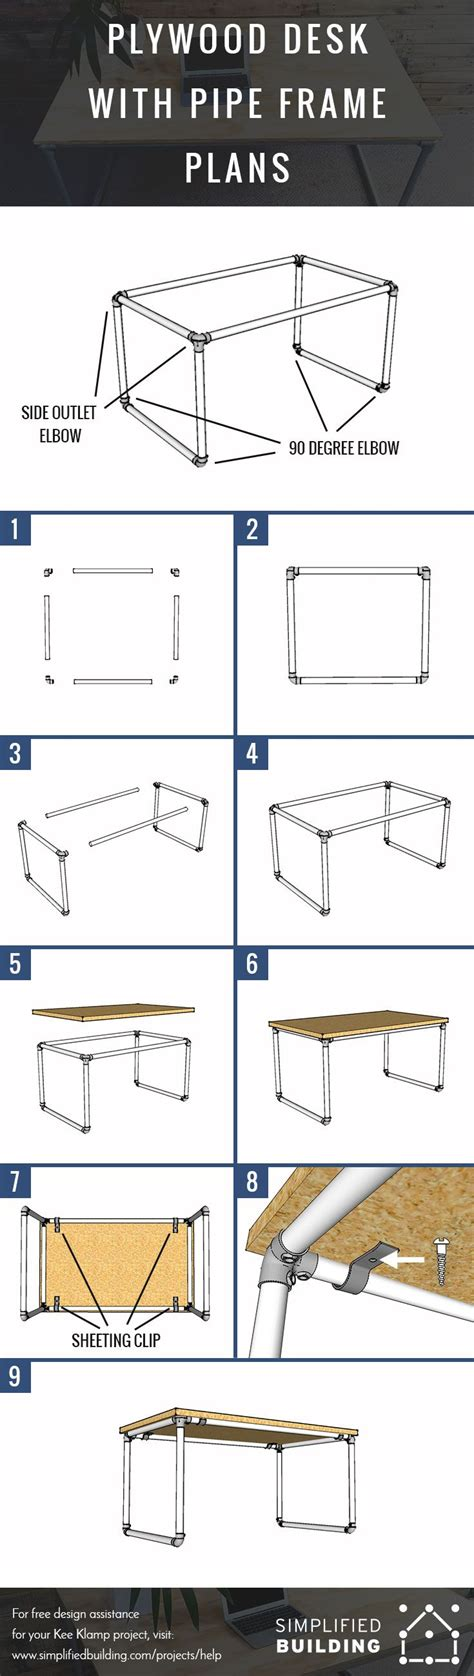 diy pipe desk plans best 25 pipe desk ideas on pinterest industrial pipe